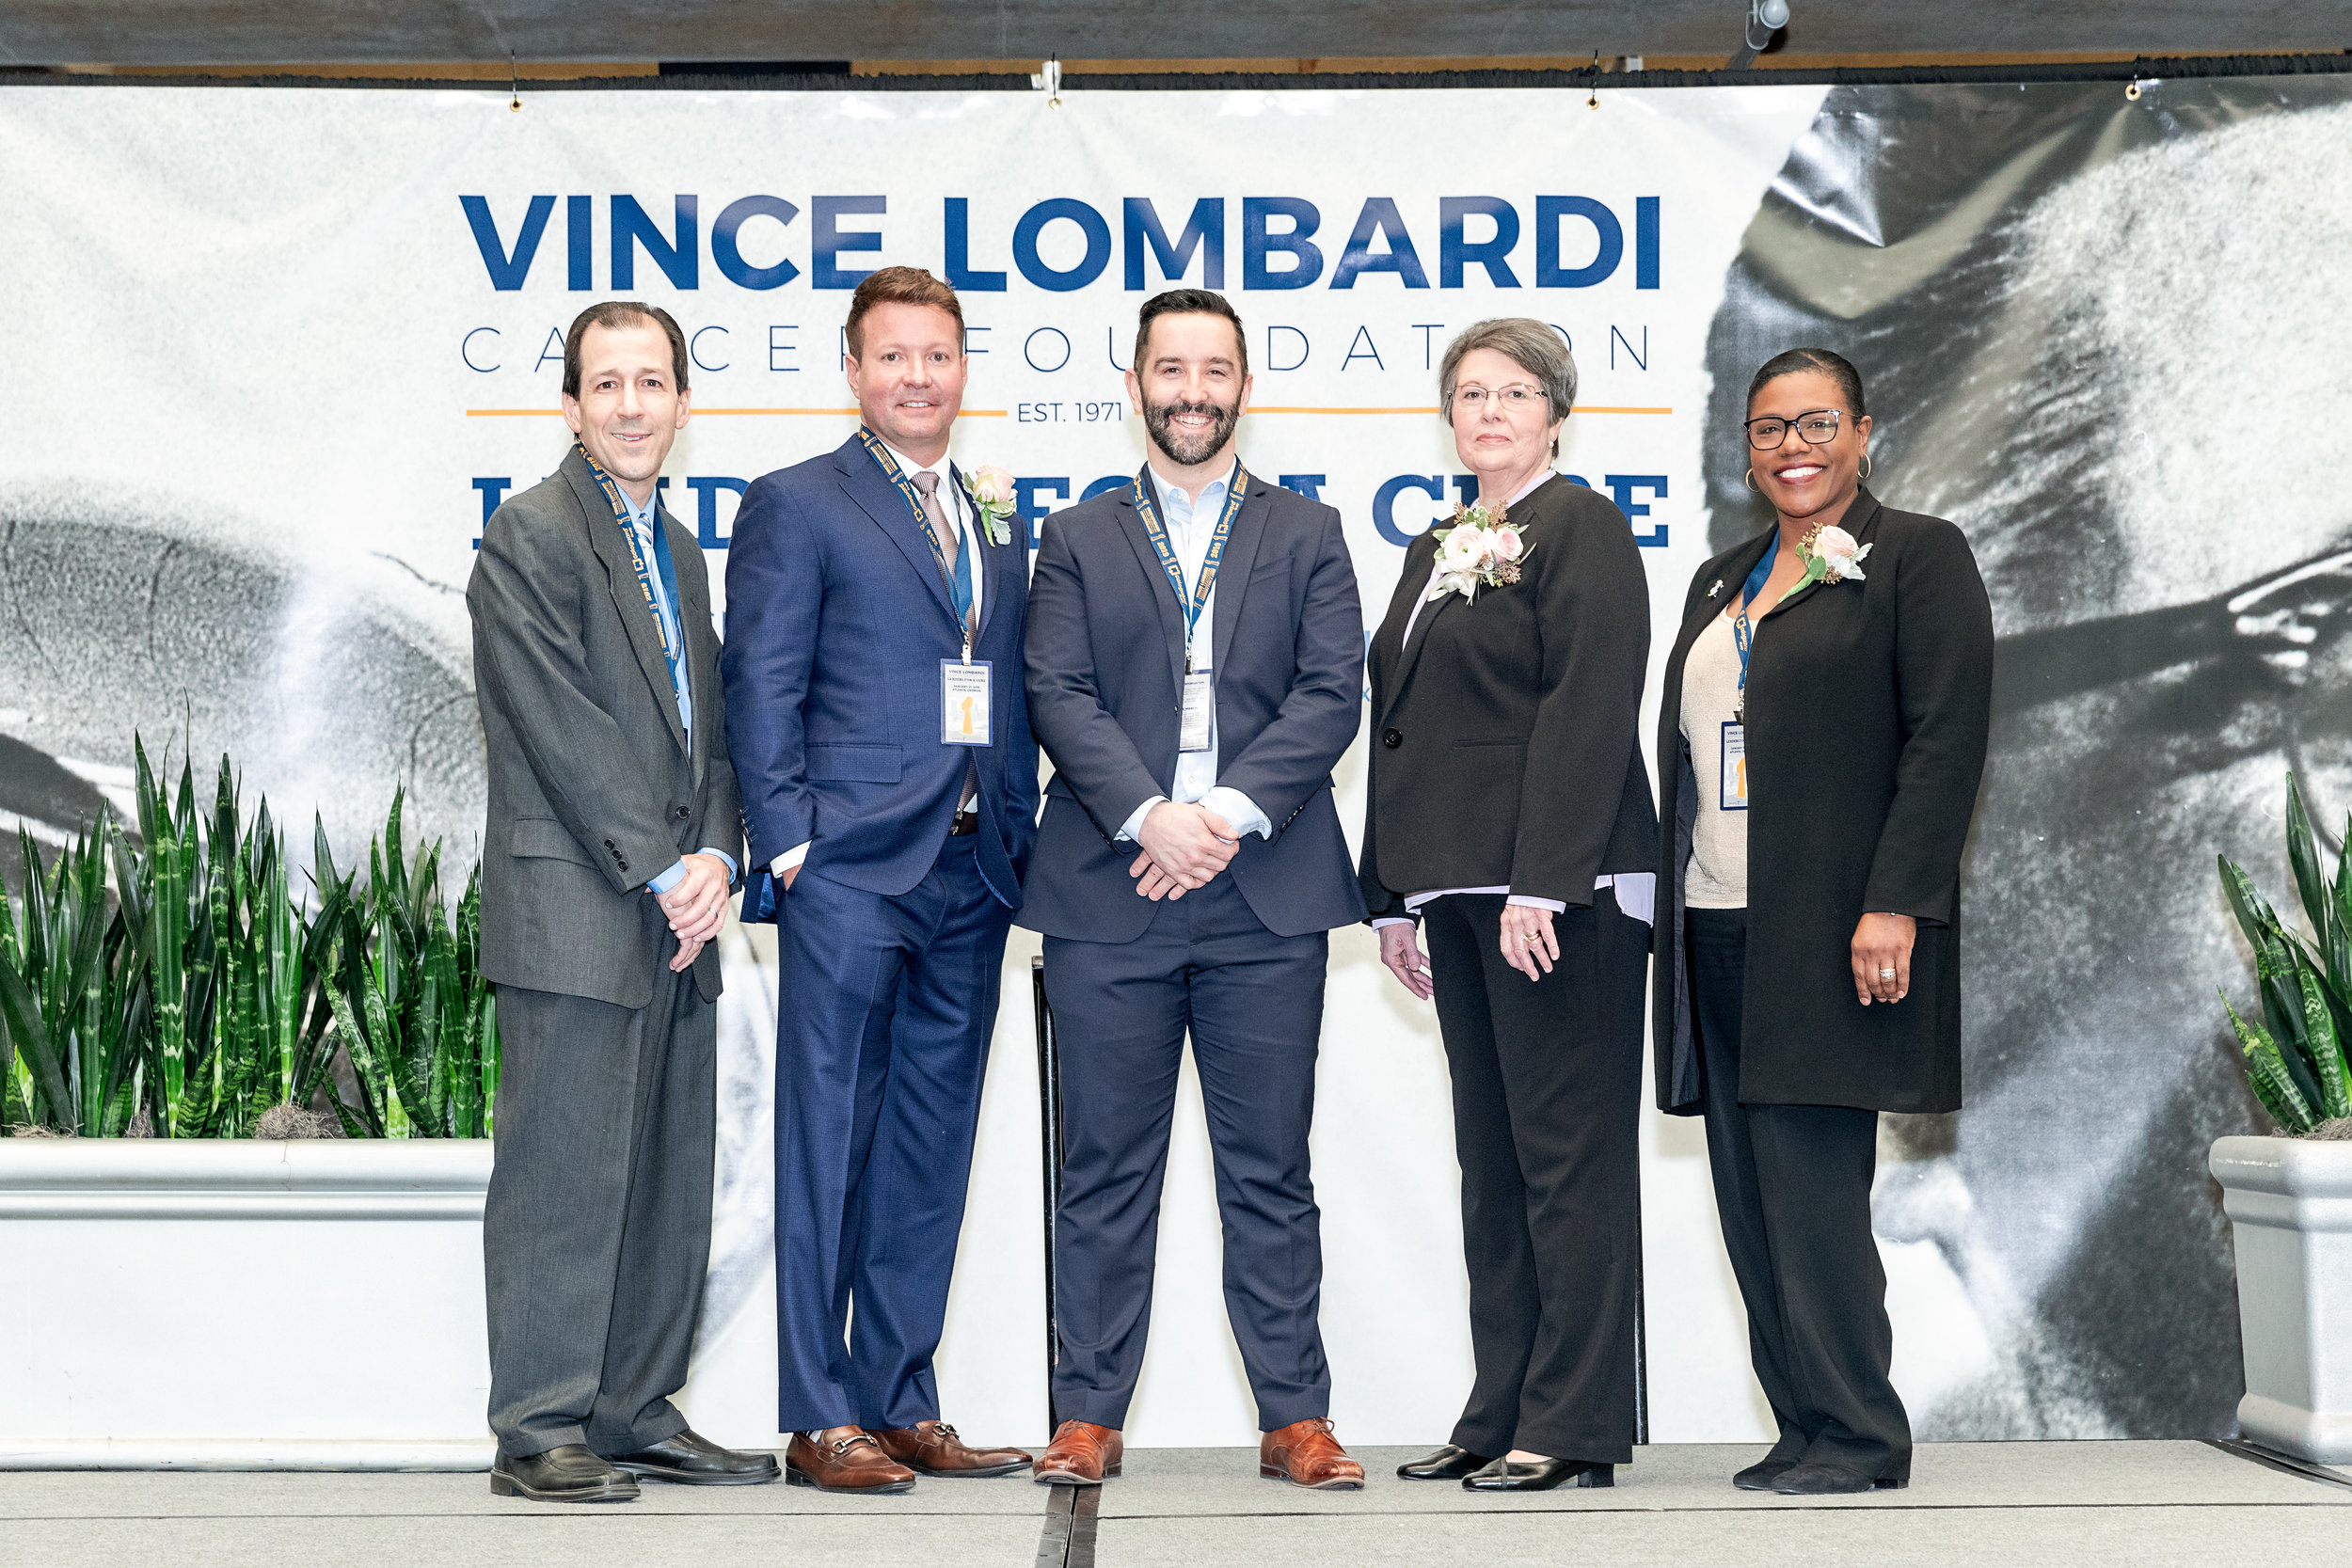 Vince Lombardi Cancer Foundation Event -20190131-0191-Edit.jpg